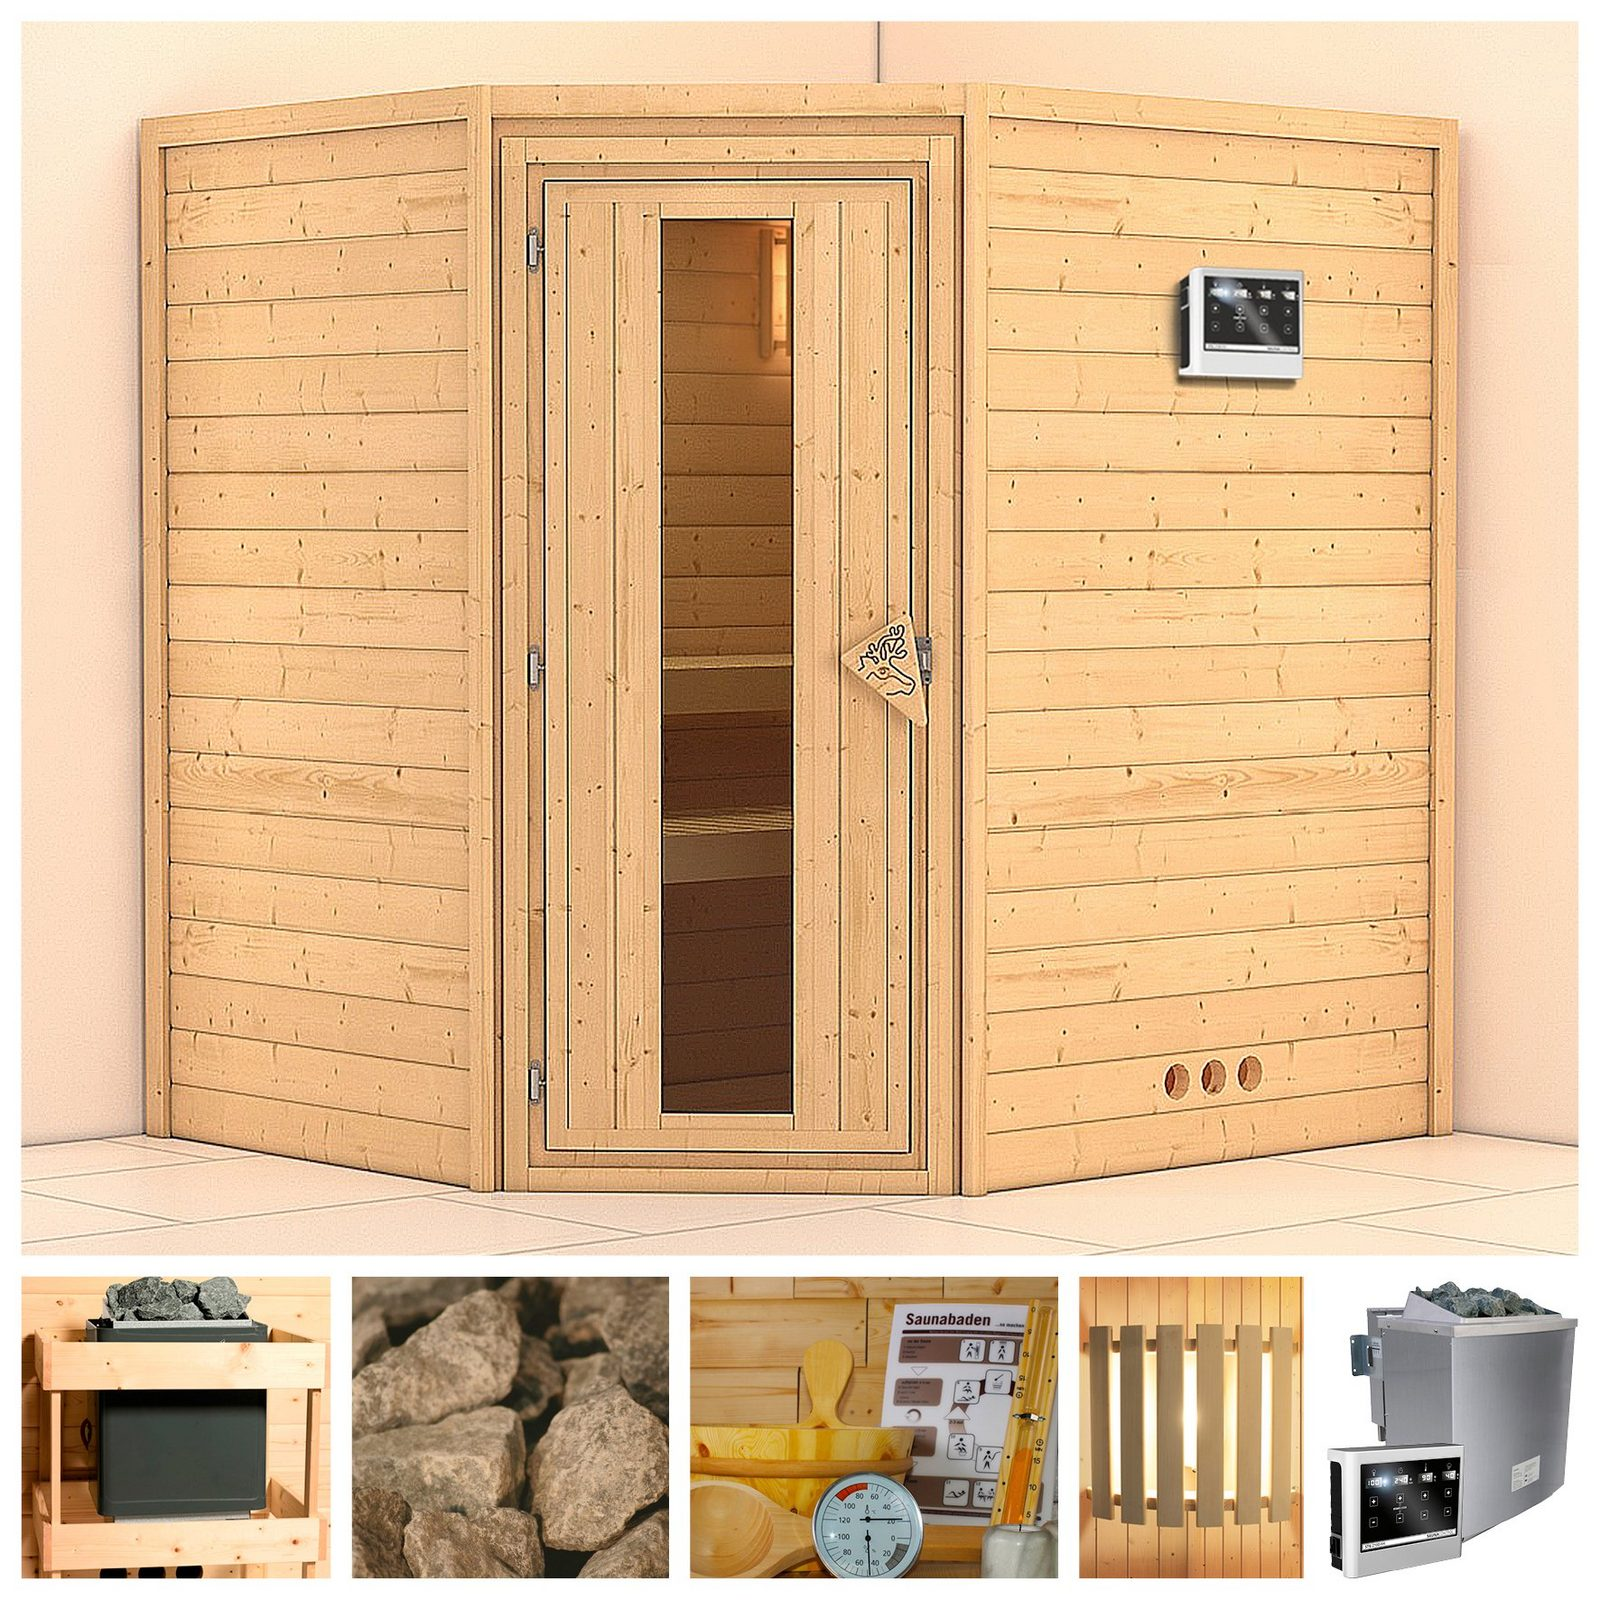 KONIFERA Sauna »Mia«, 196/170/200 cm, 9-kW-Bio-Ofen mit ext. Strg., Holztür